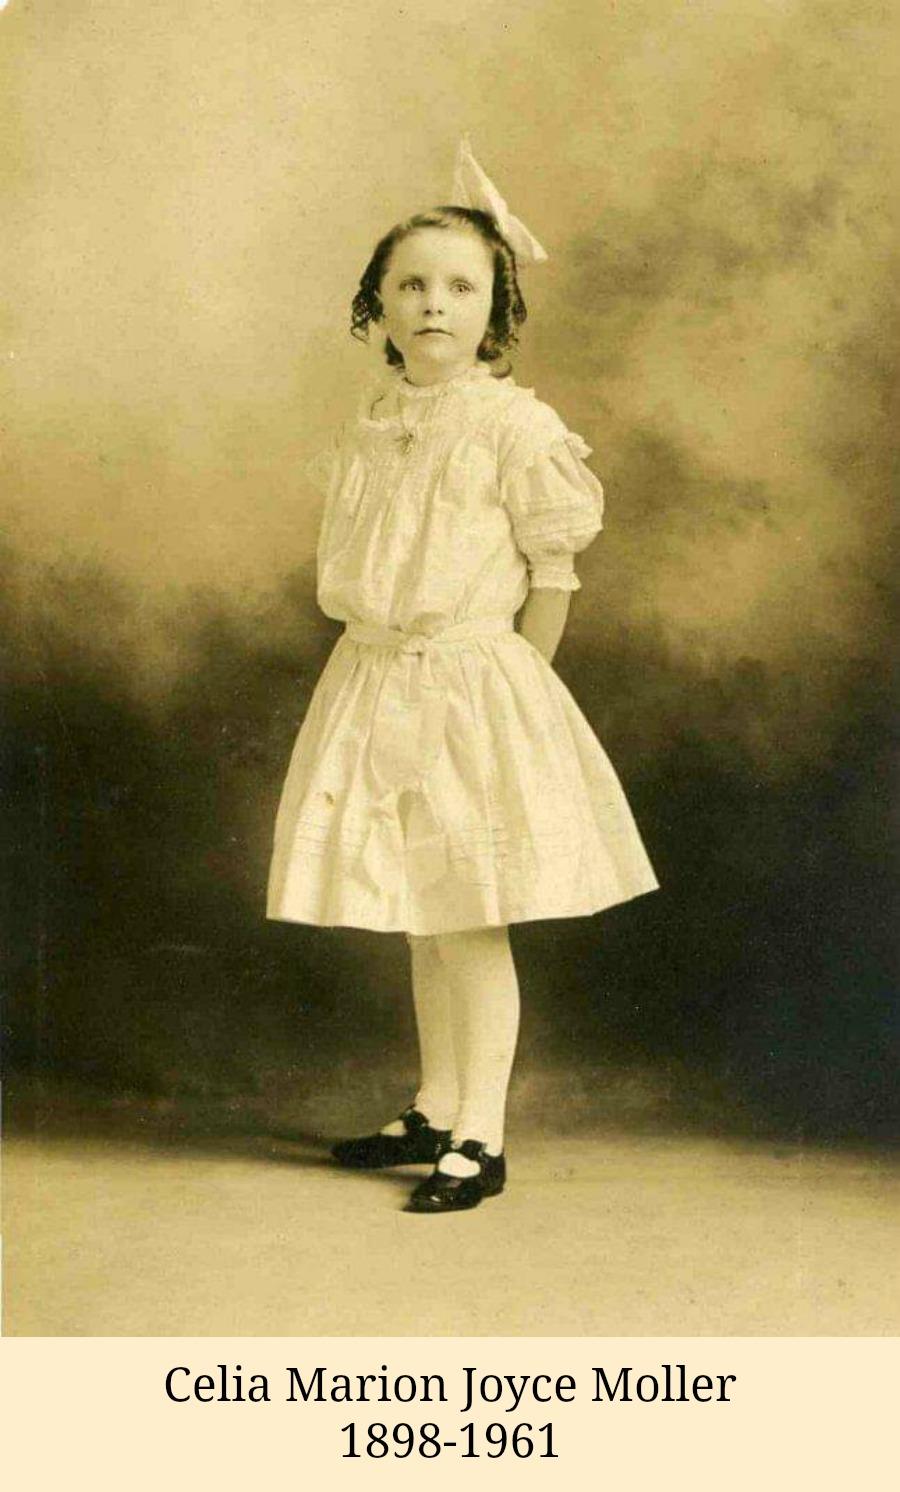 Celia Marion Joyce Moller